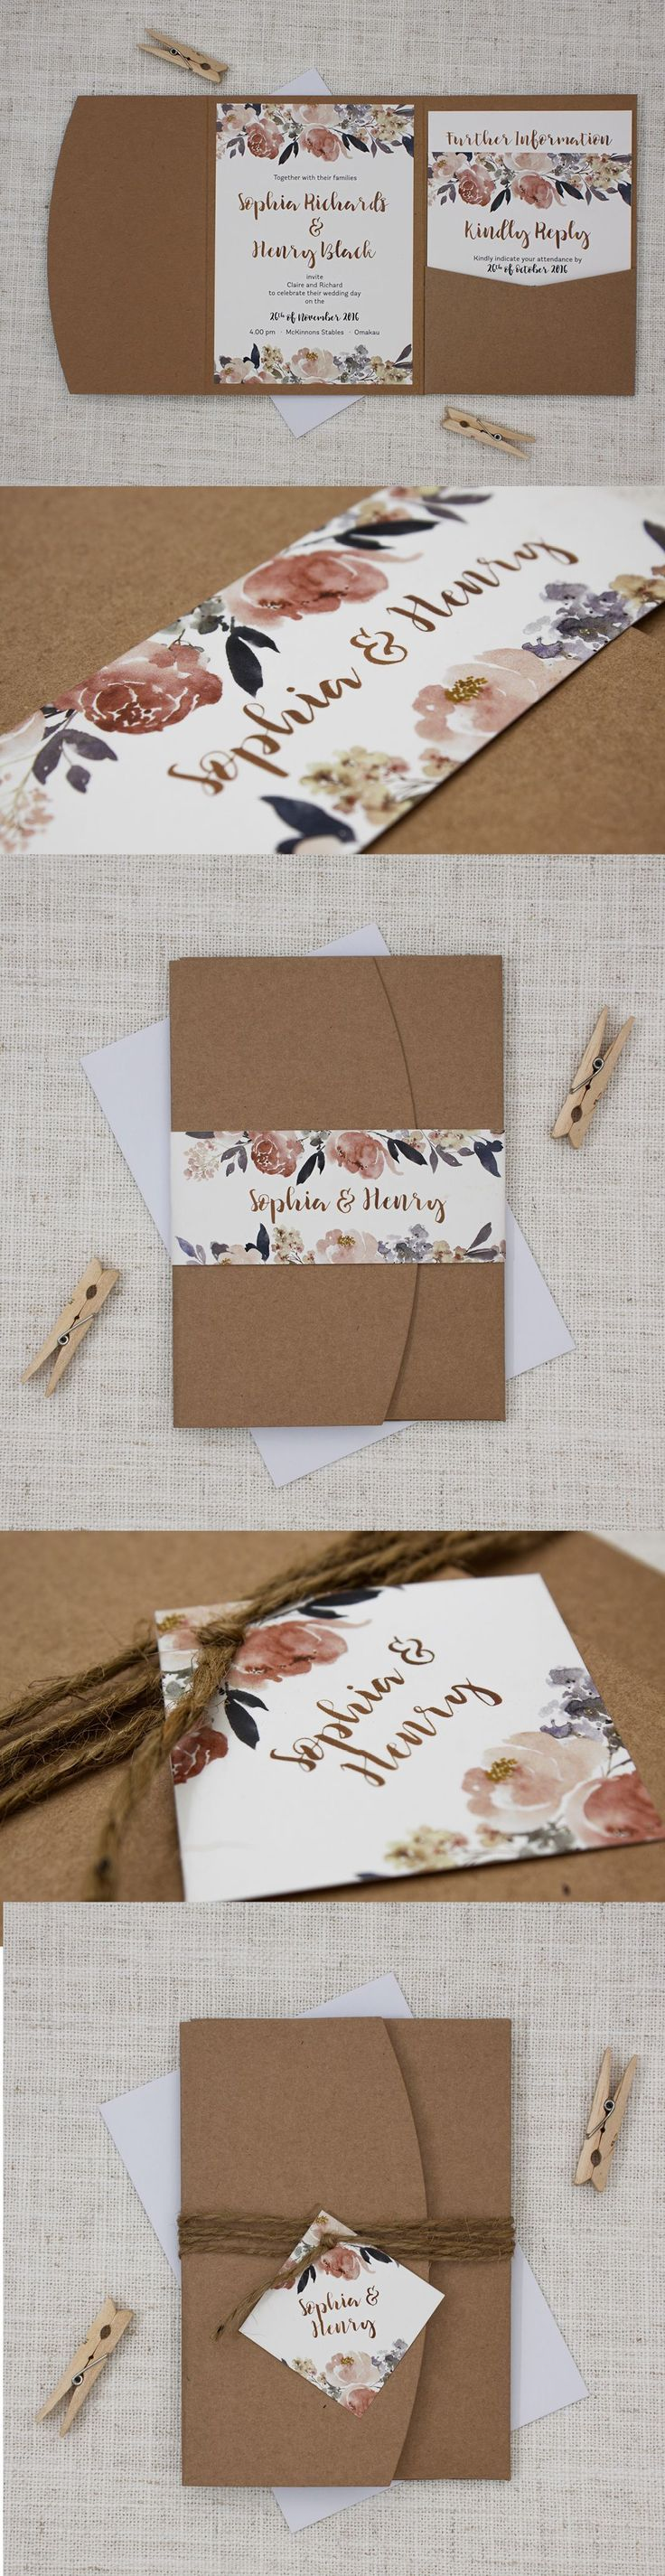 wedding invitation wording for hindu marriage%0A Beautiful rustic pocketfolds wedding invitation with flowers